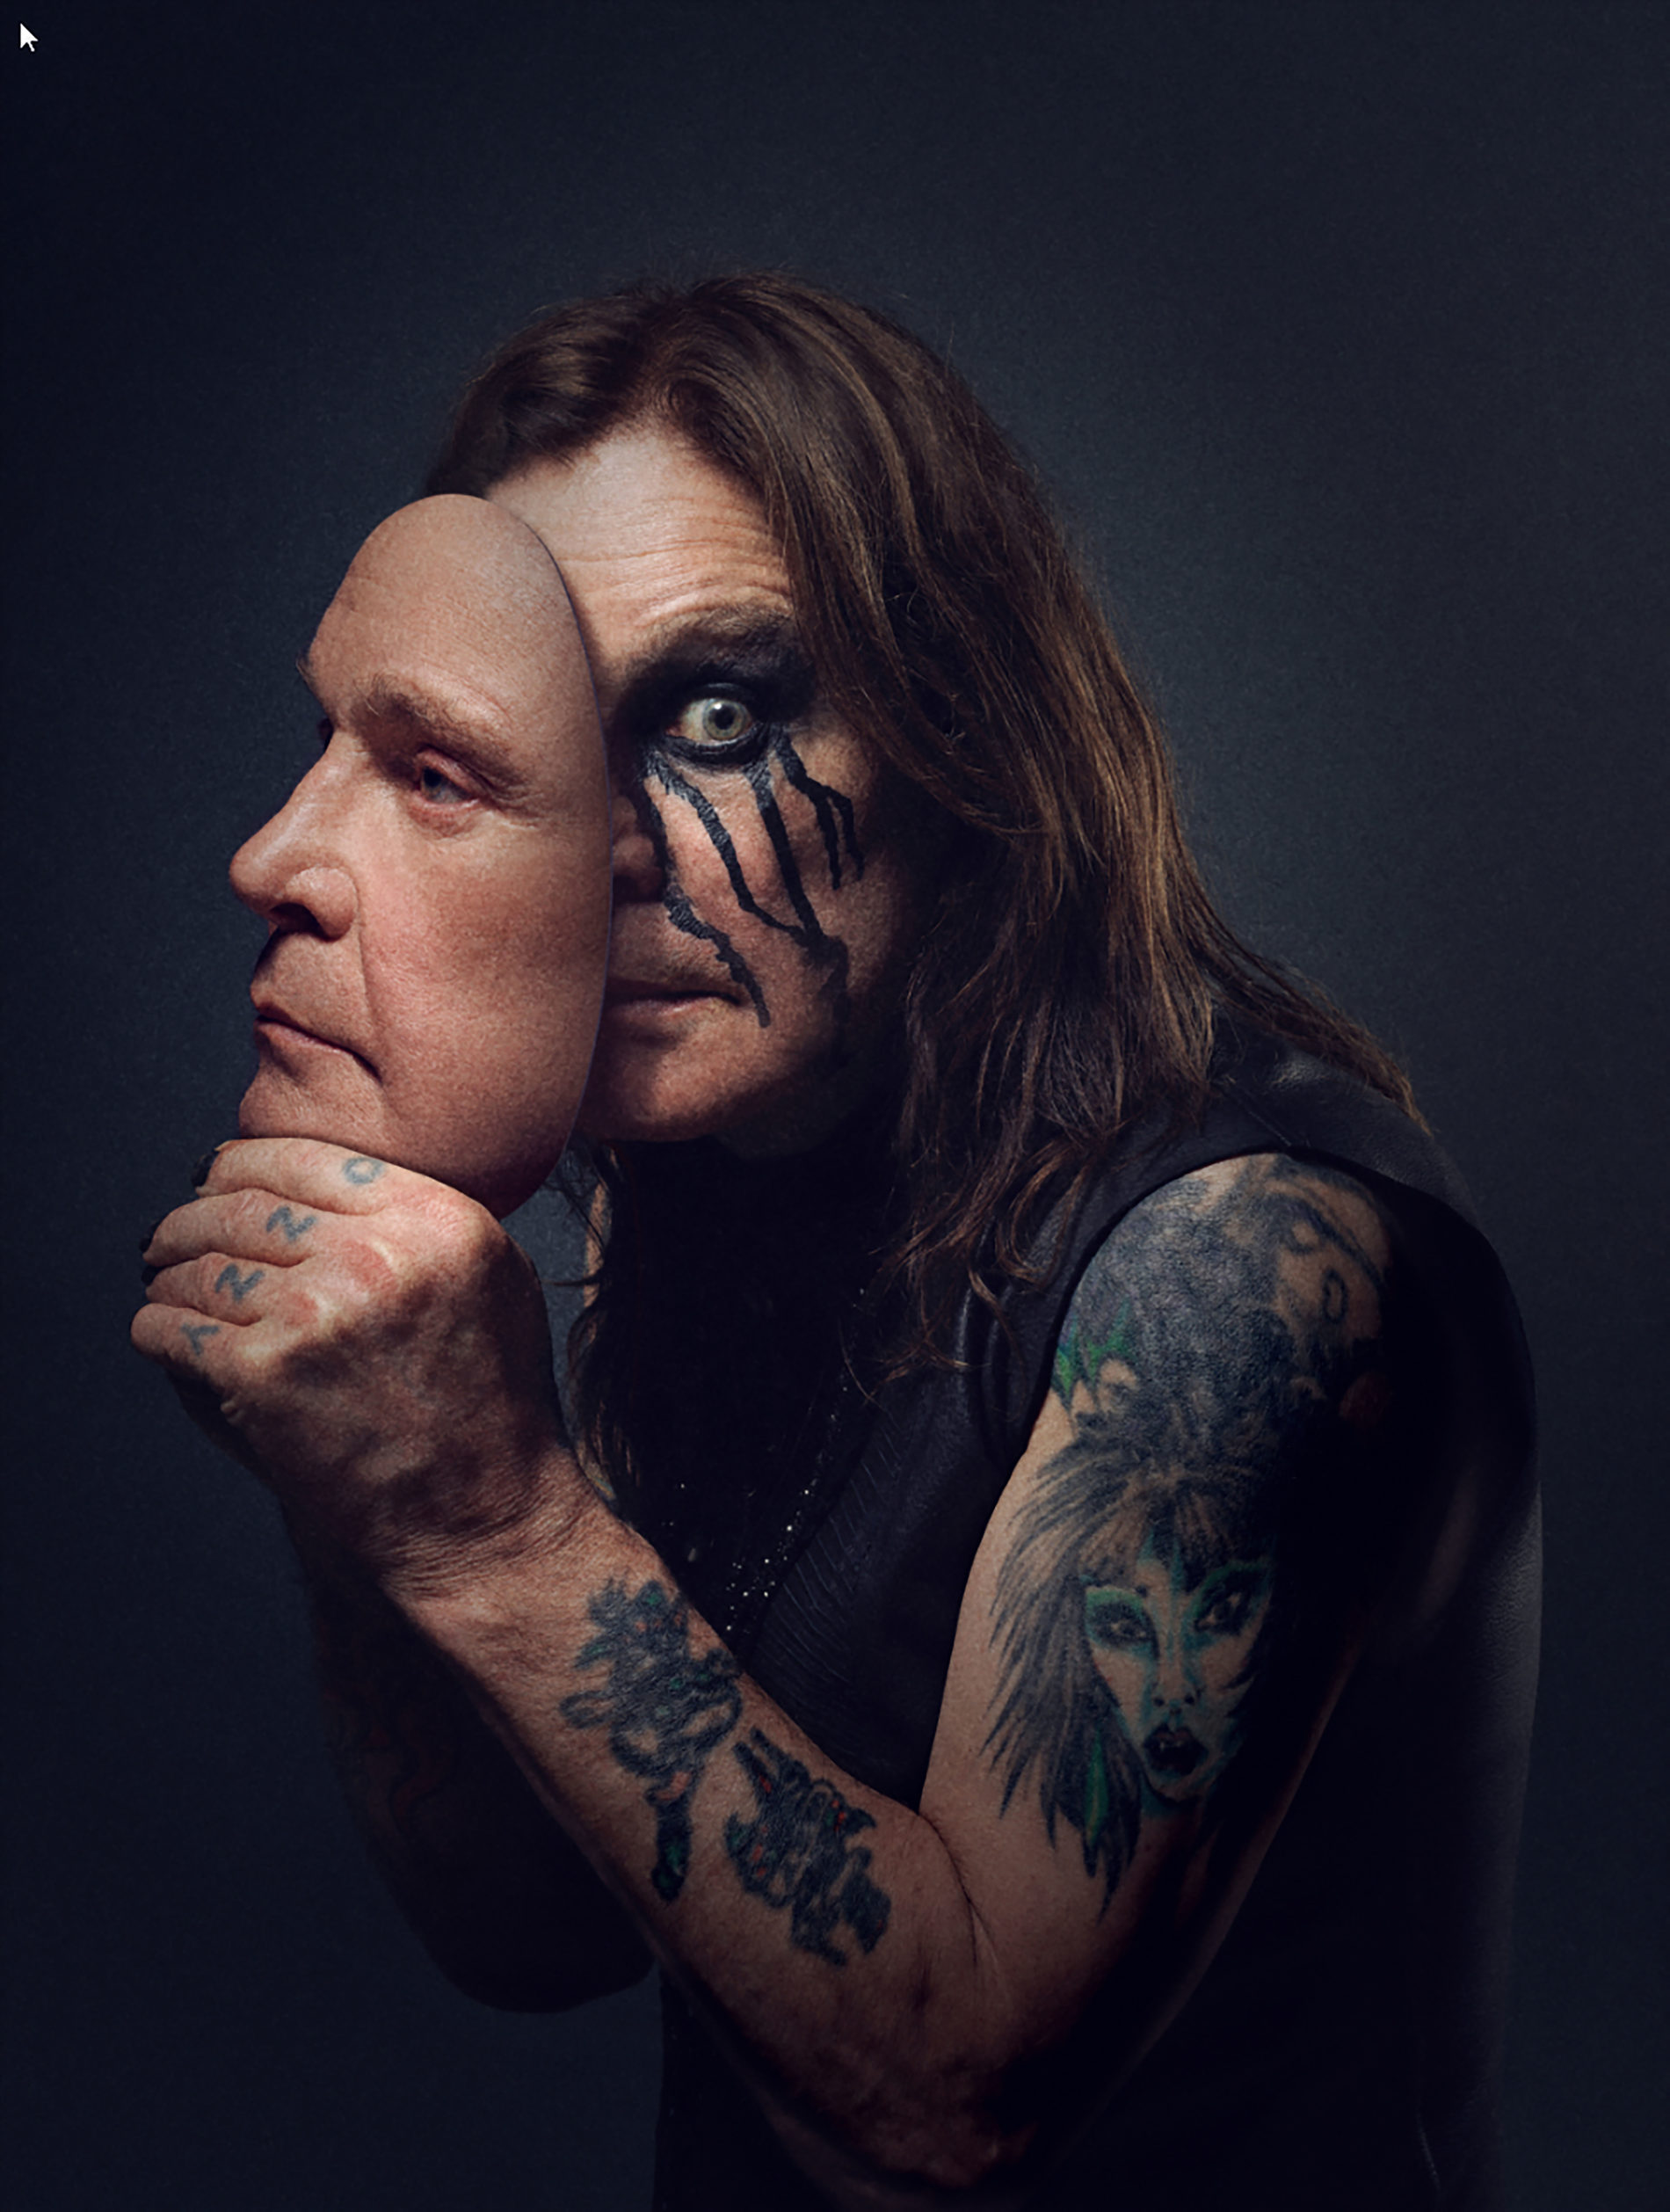 Ozzy Osbourne – komplette Tour muss verschoben werden